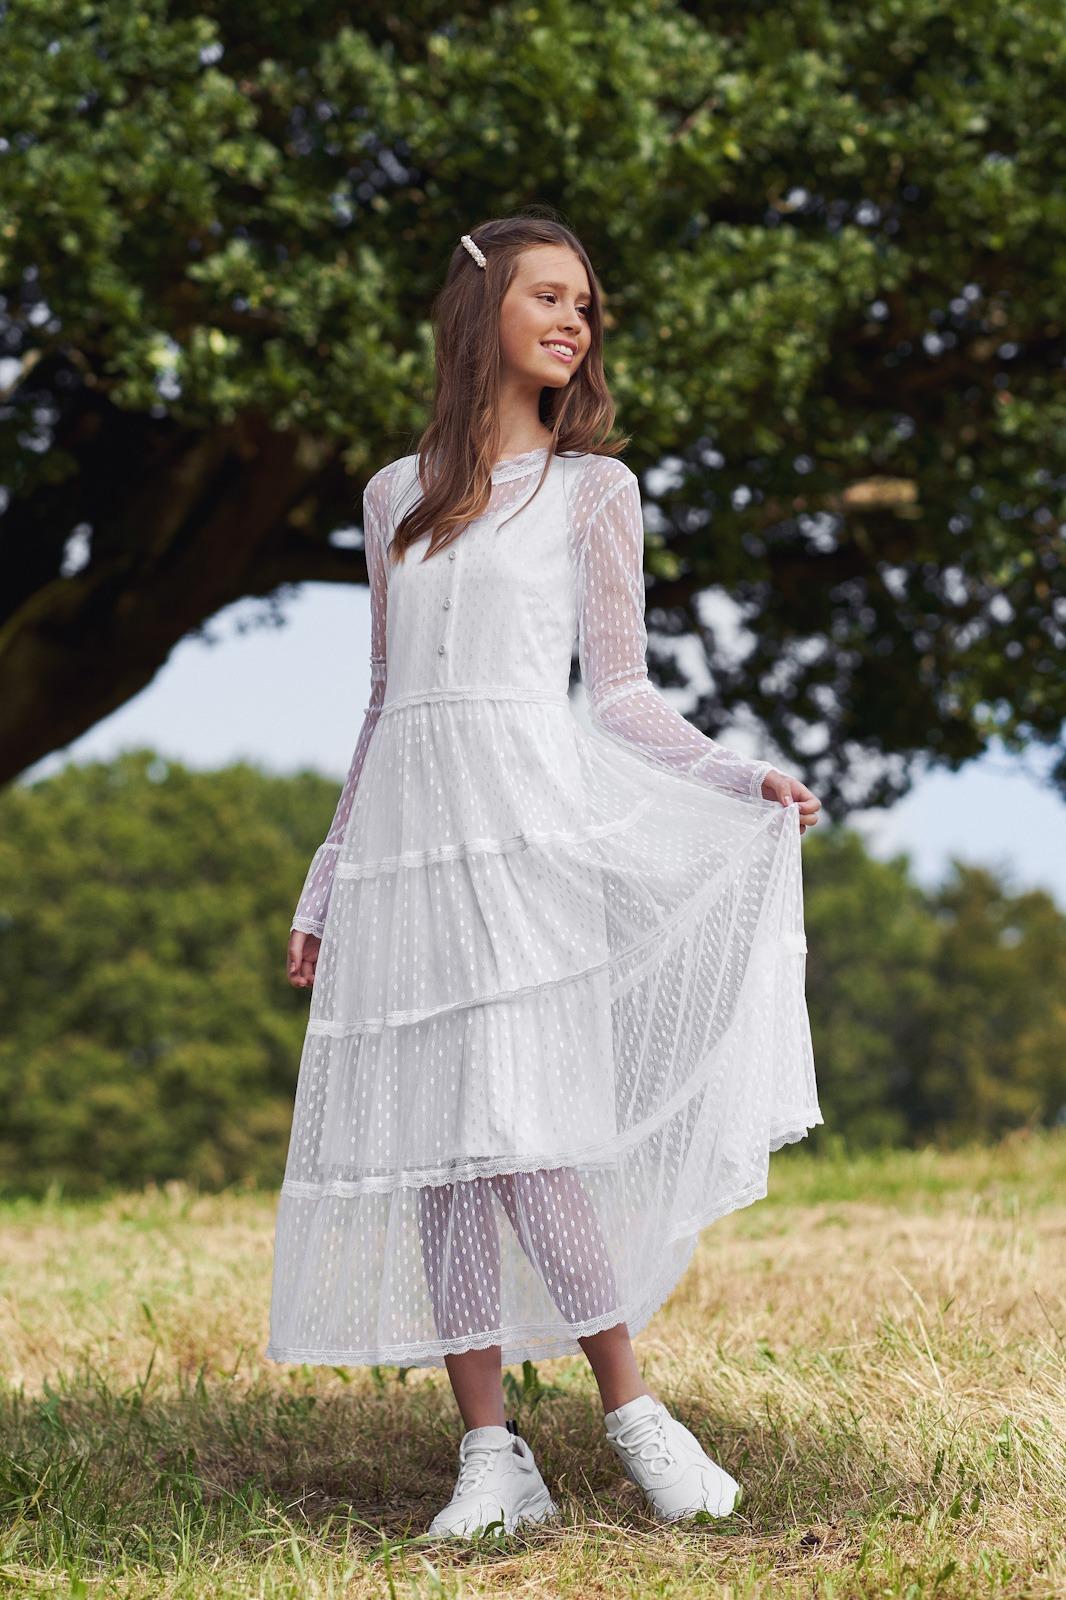 Vildt smuk konfirmationskjole med blonder fra Real Silk. Se model Netti hos Unique Kjoler.